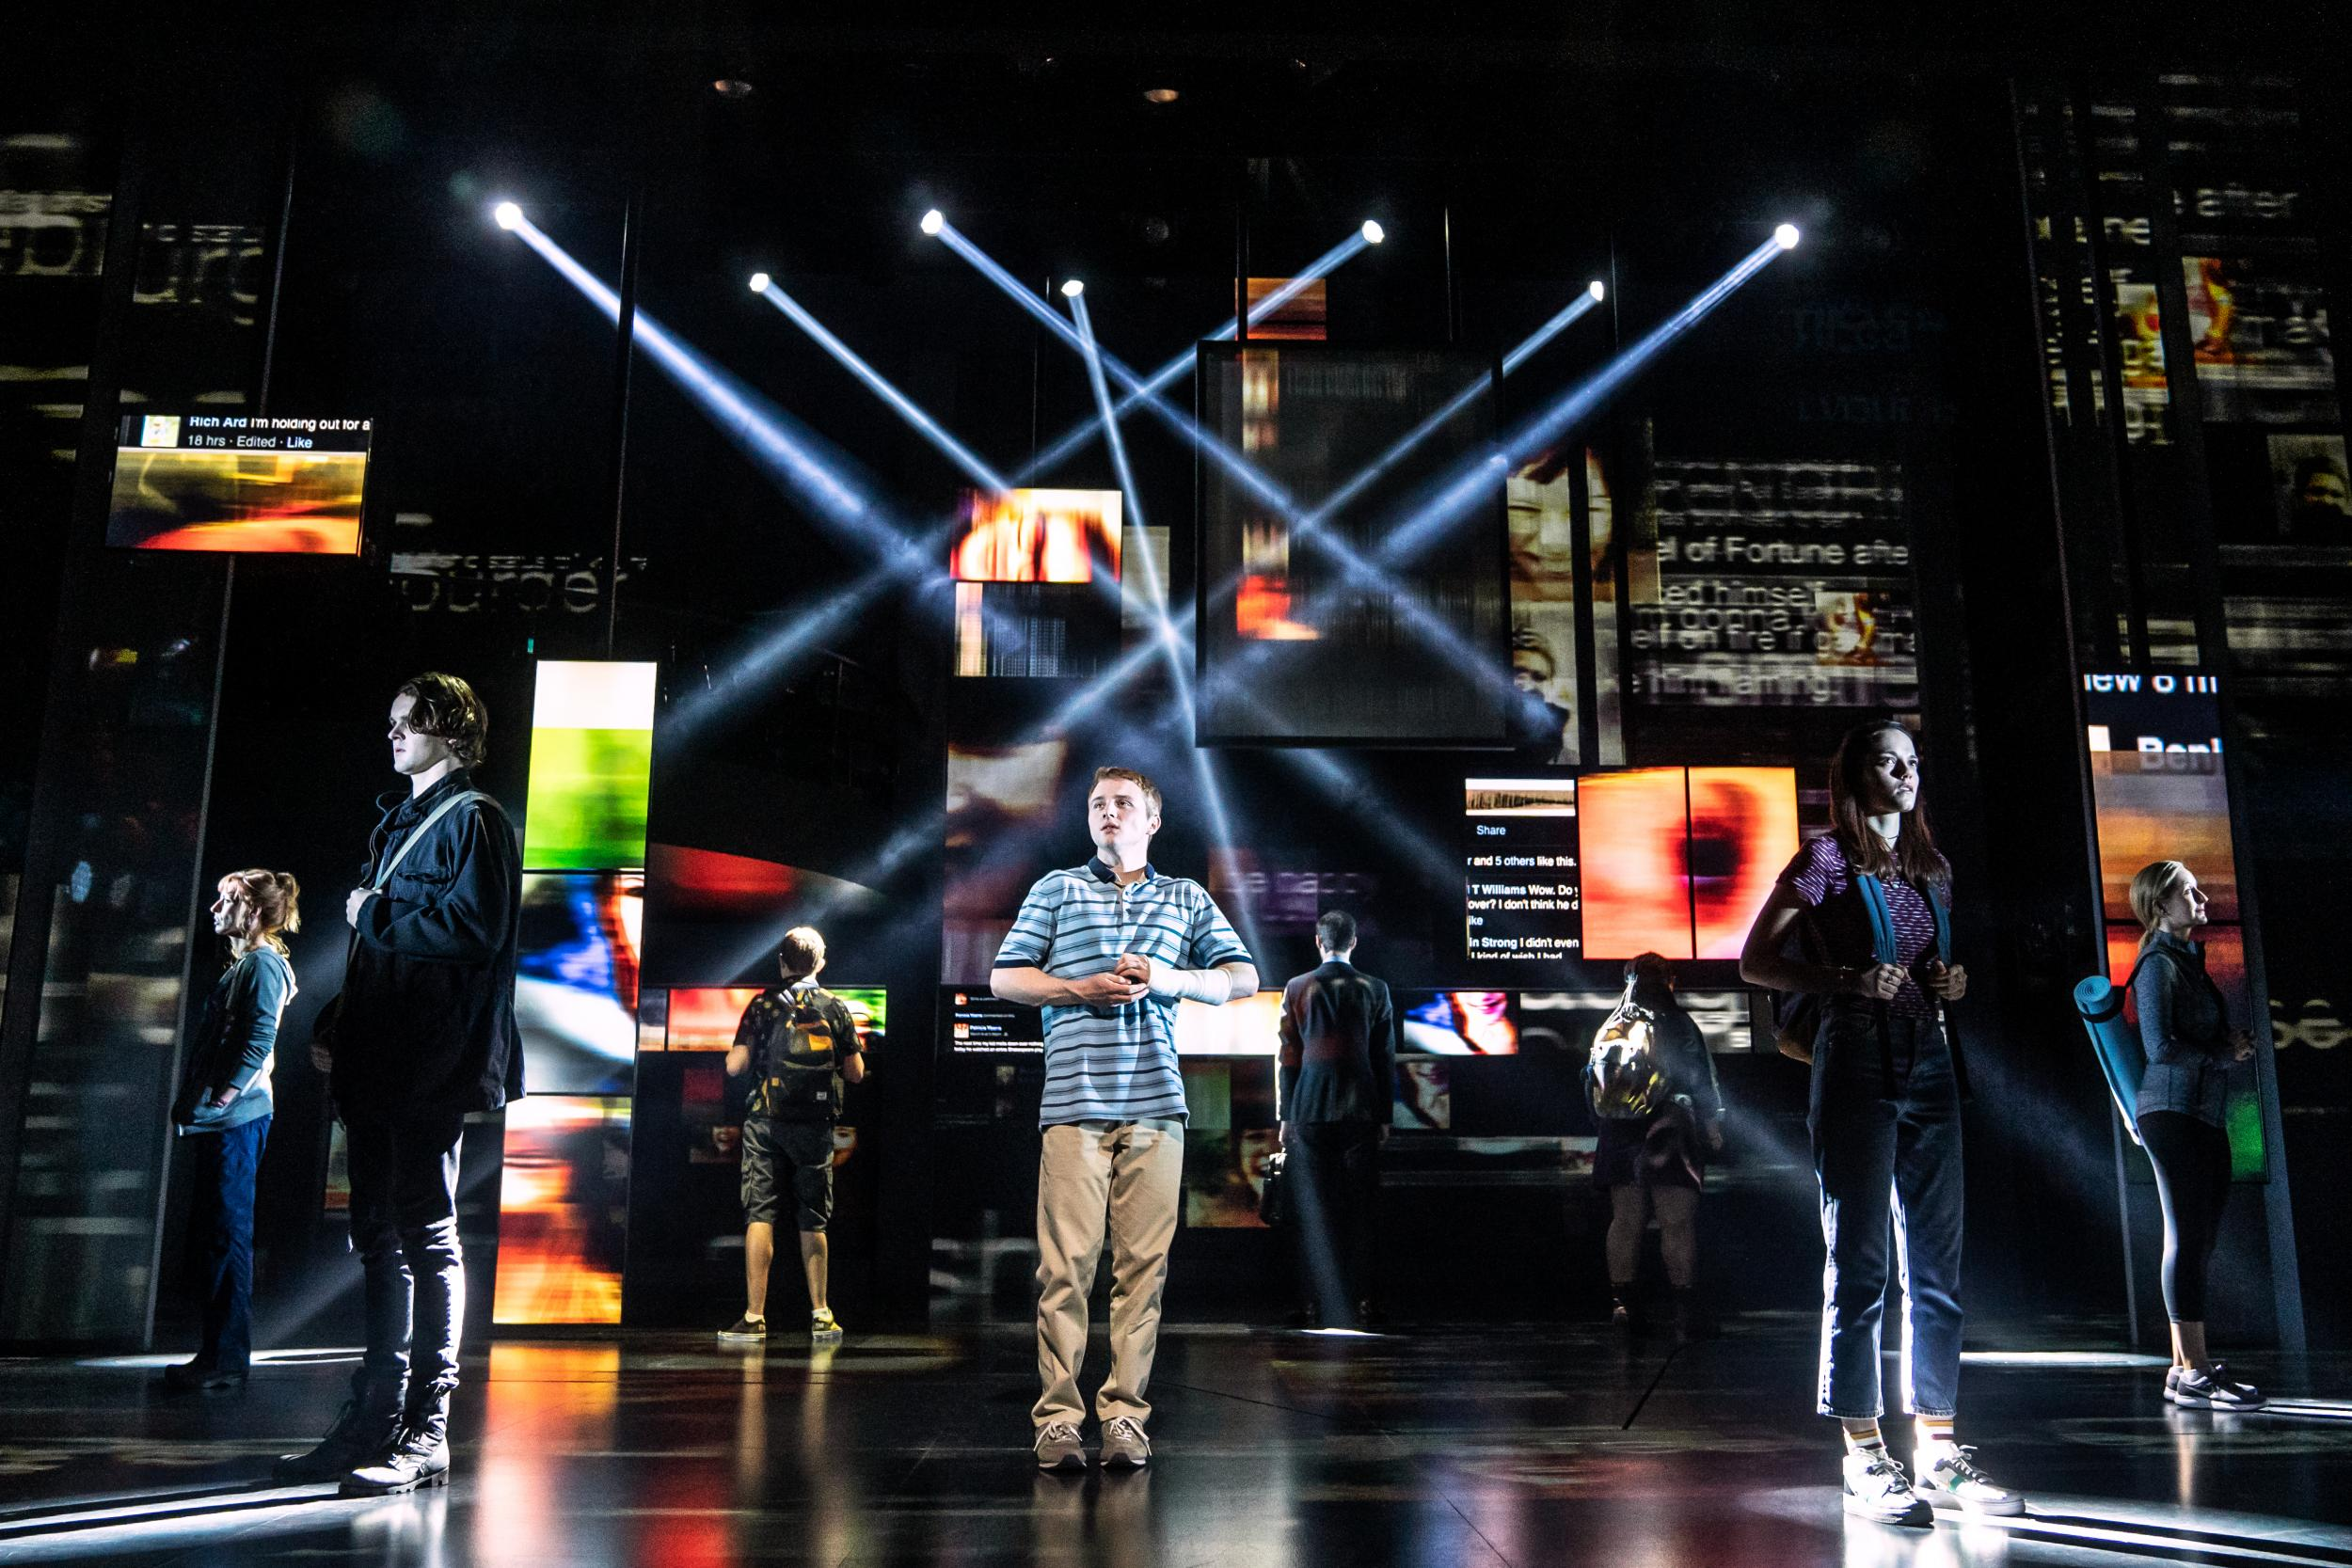 Dear Evan Hansen review, Noel Coward Theatre: A superb, unmissable musical